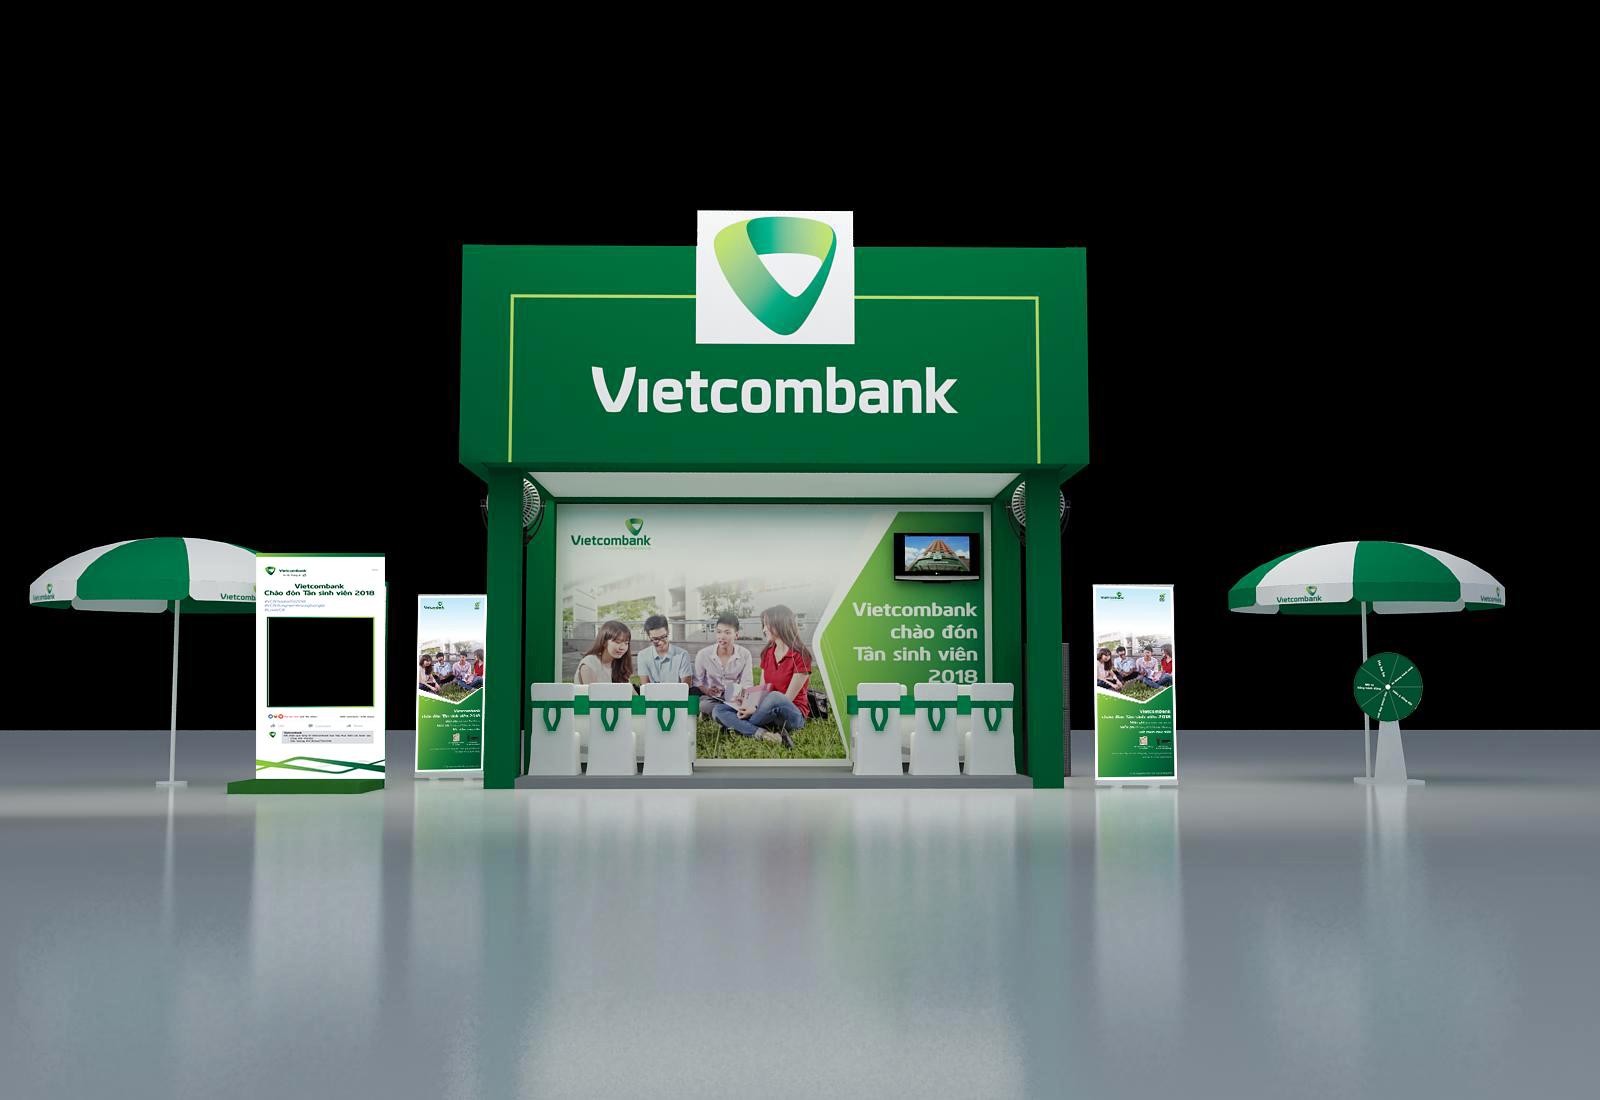 Vietcombank Booth